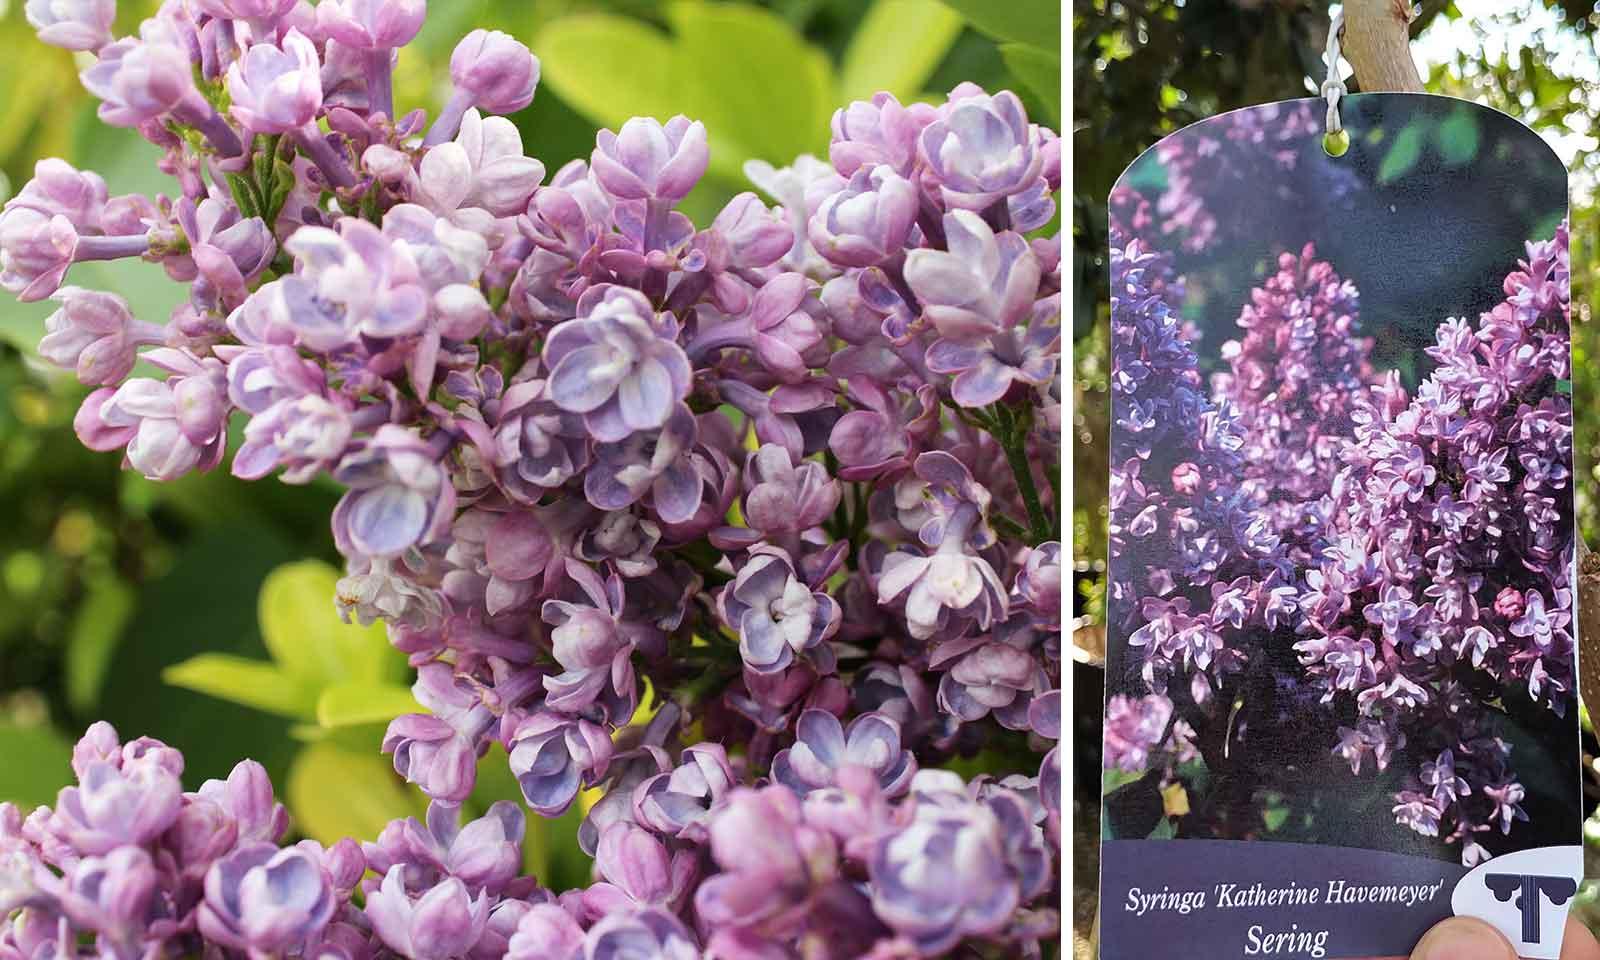 Syringa Vulgaris (Common Lilac / Pipe Privet)